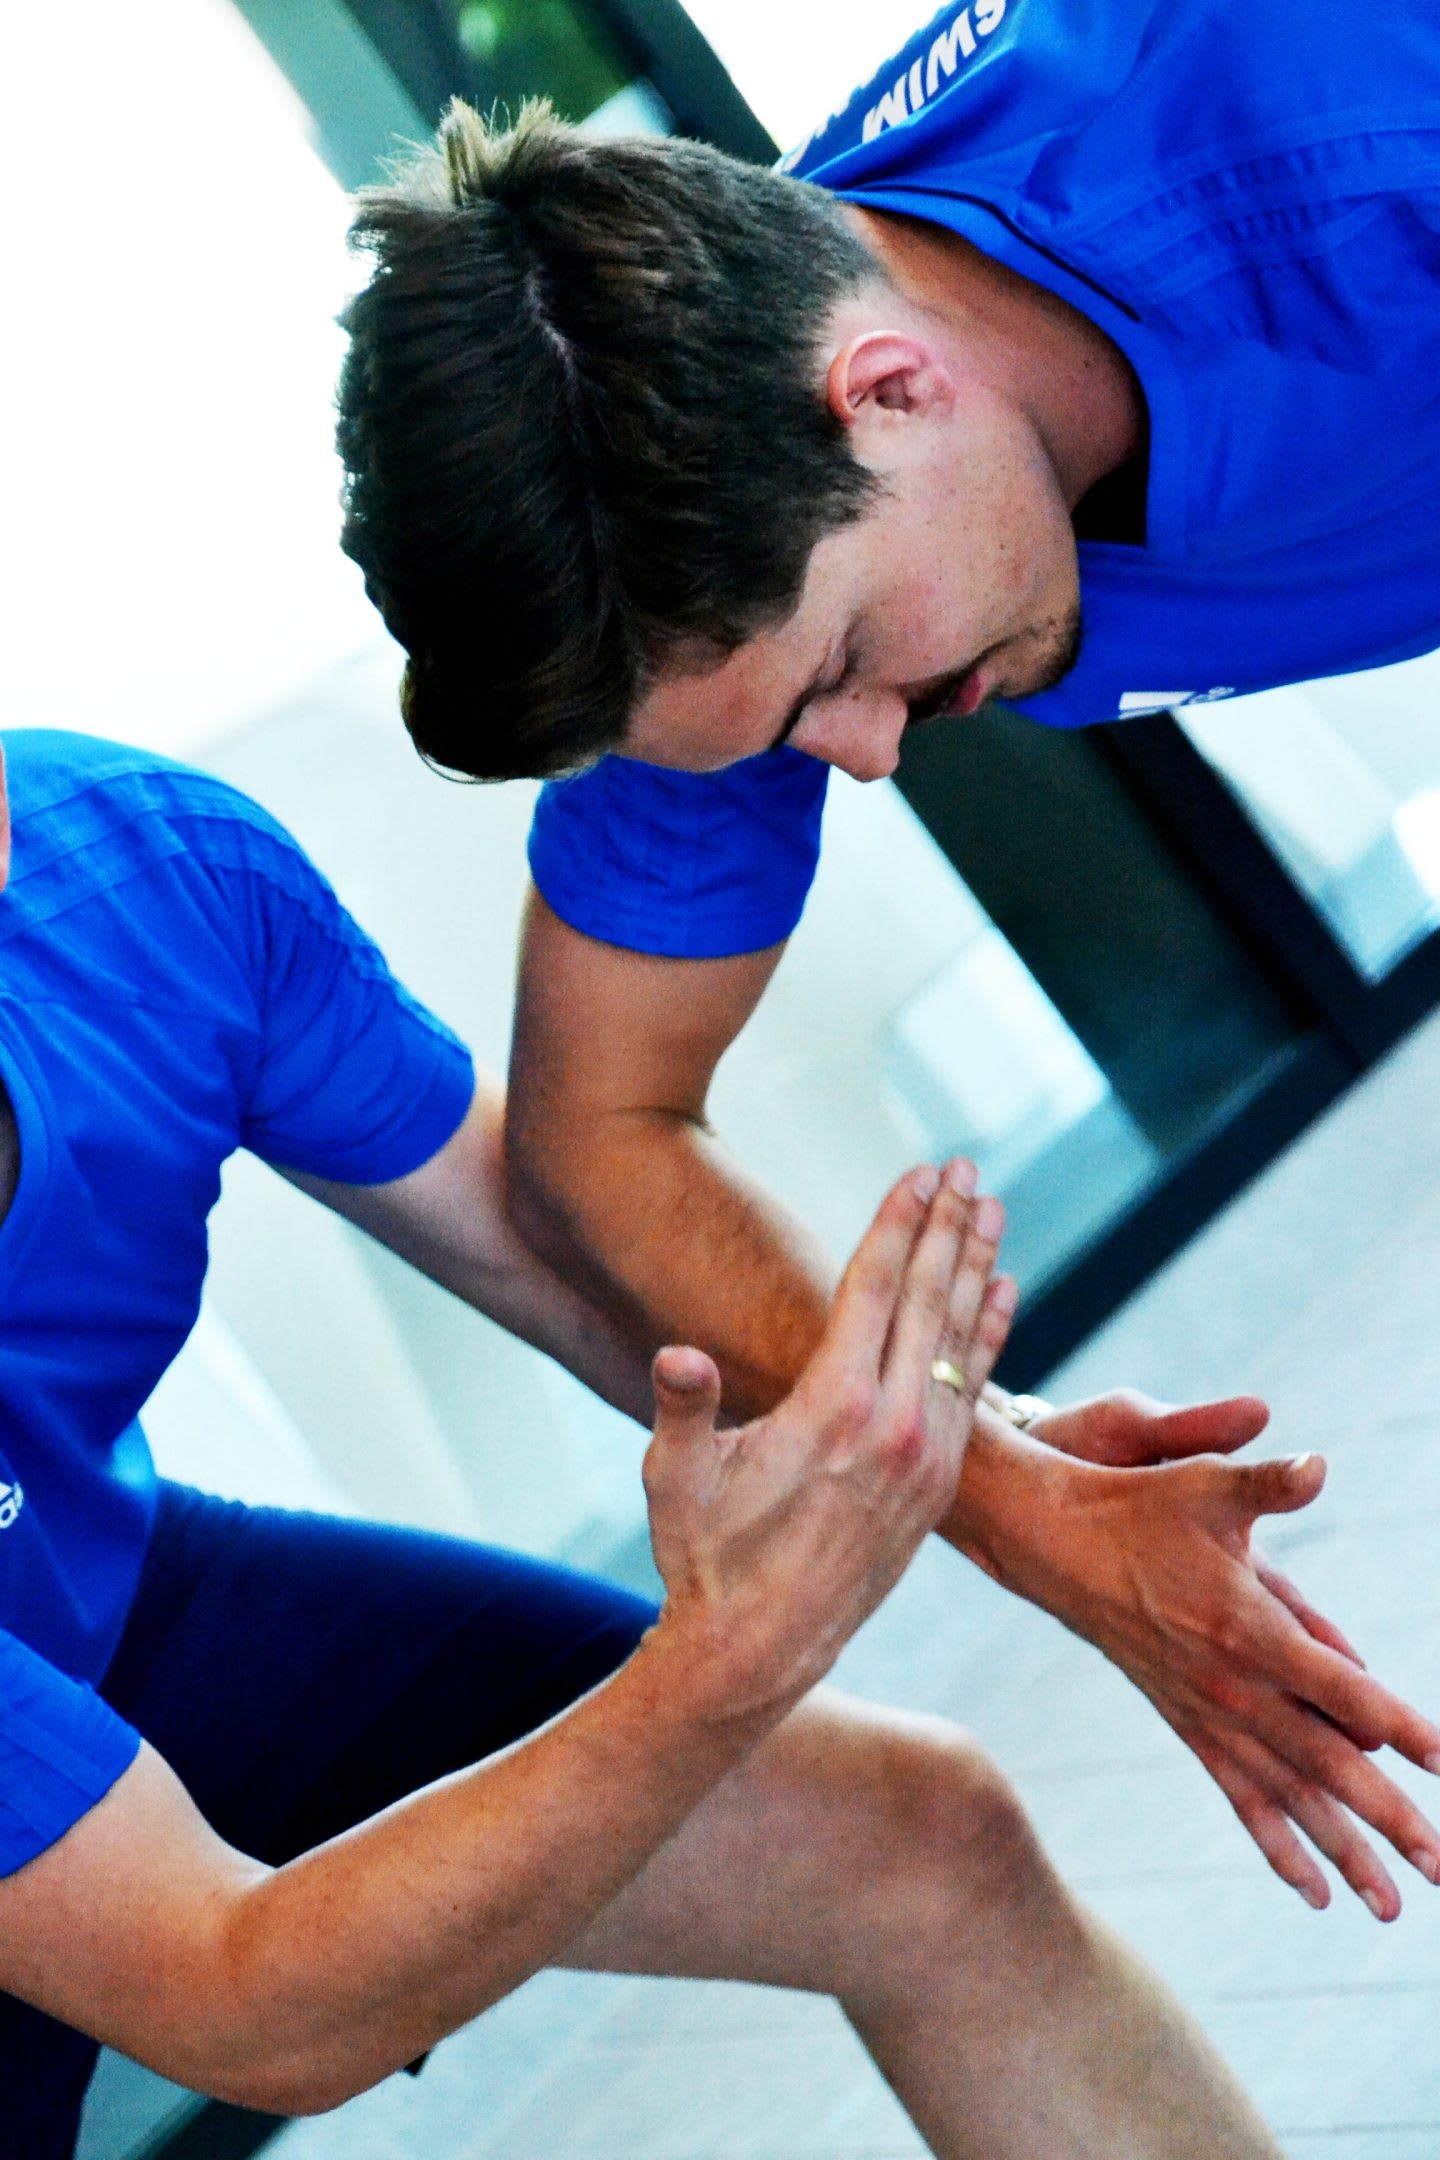 Two teammates high five. team, encouragement, teamwork, motivation